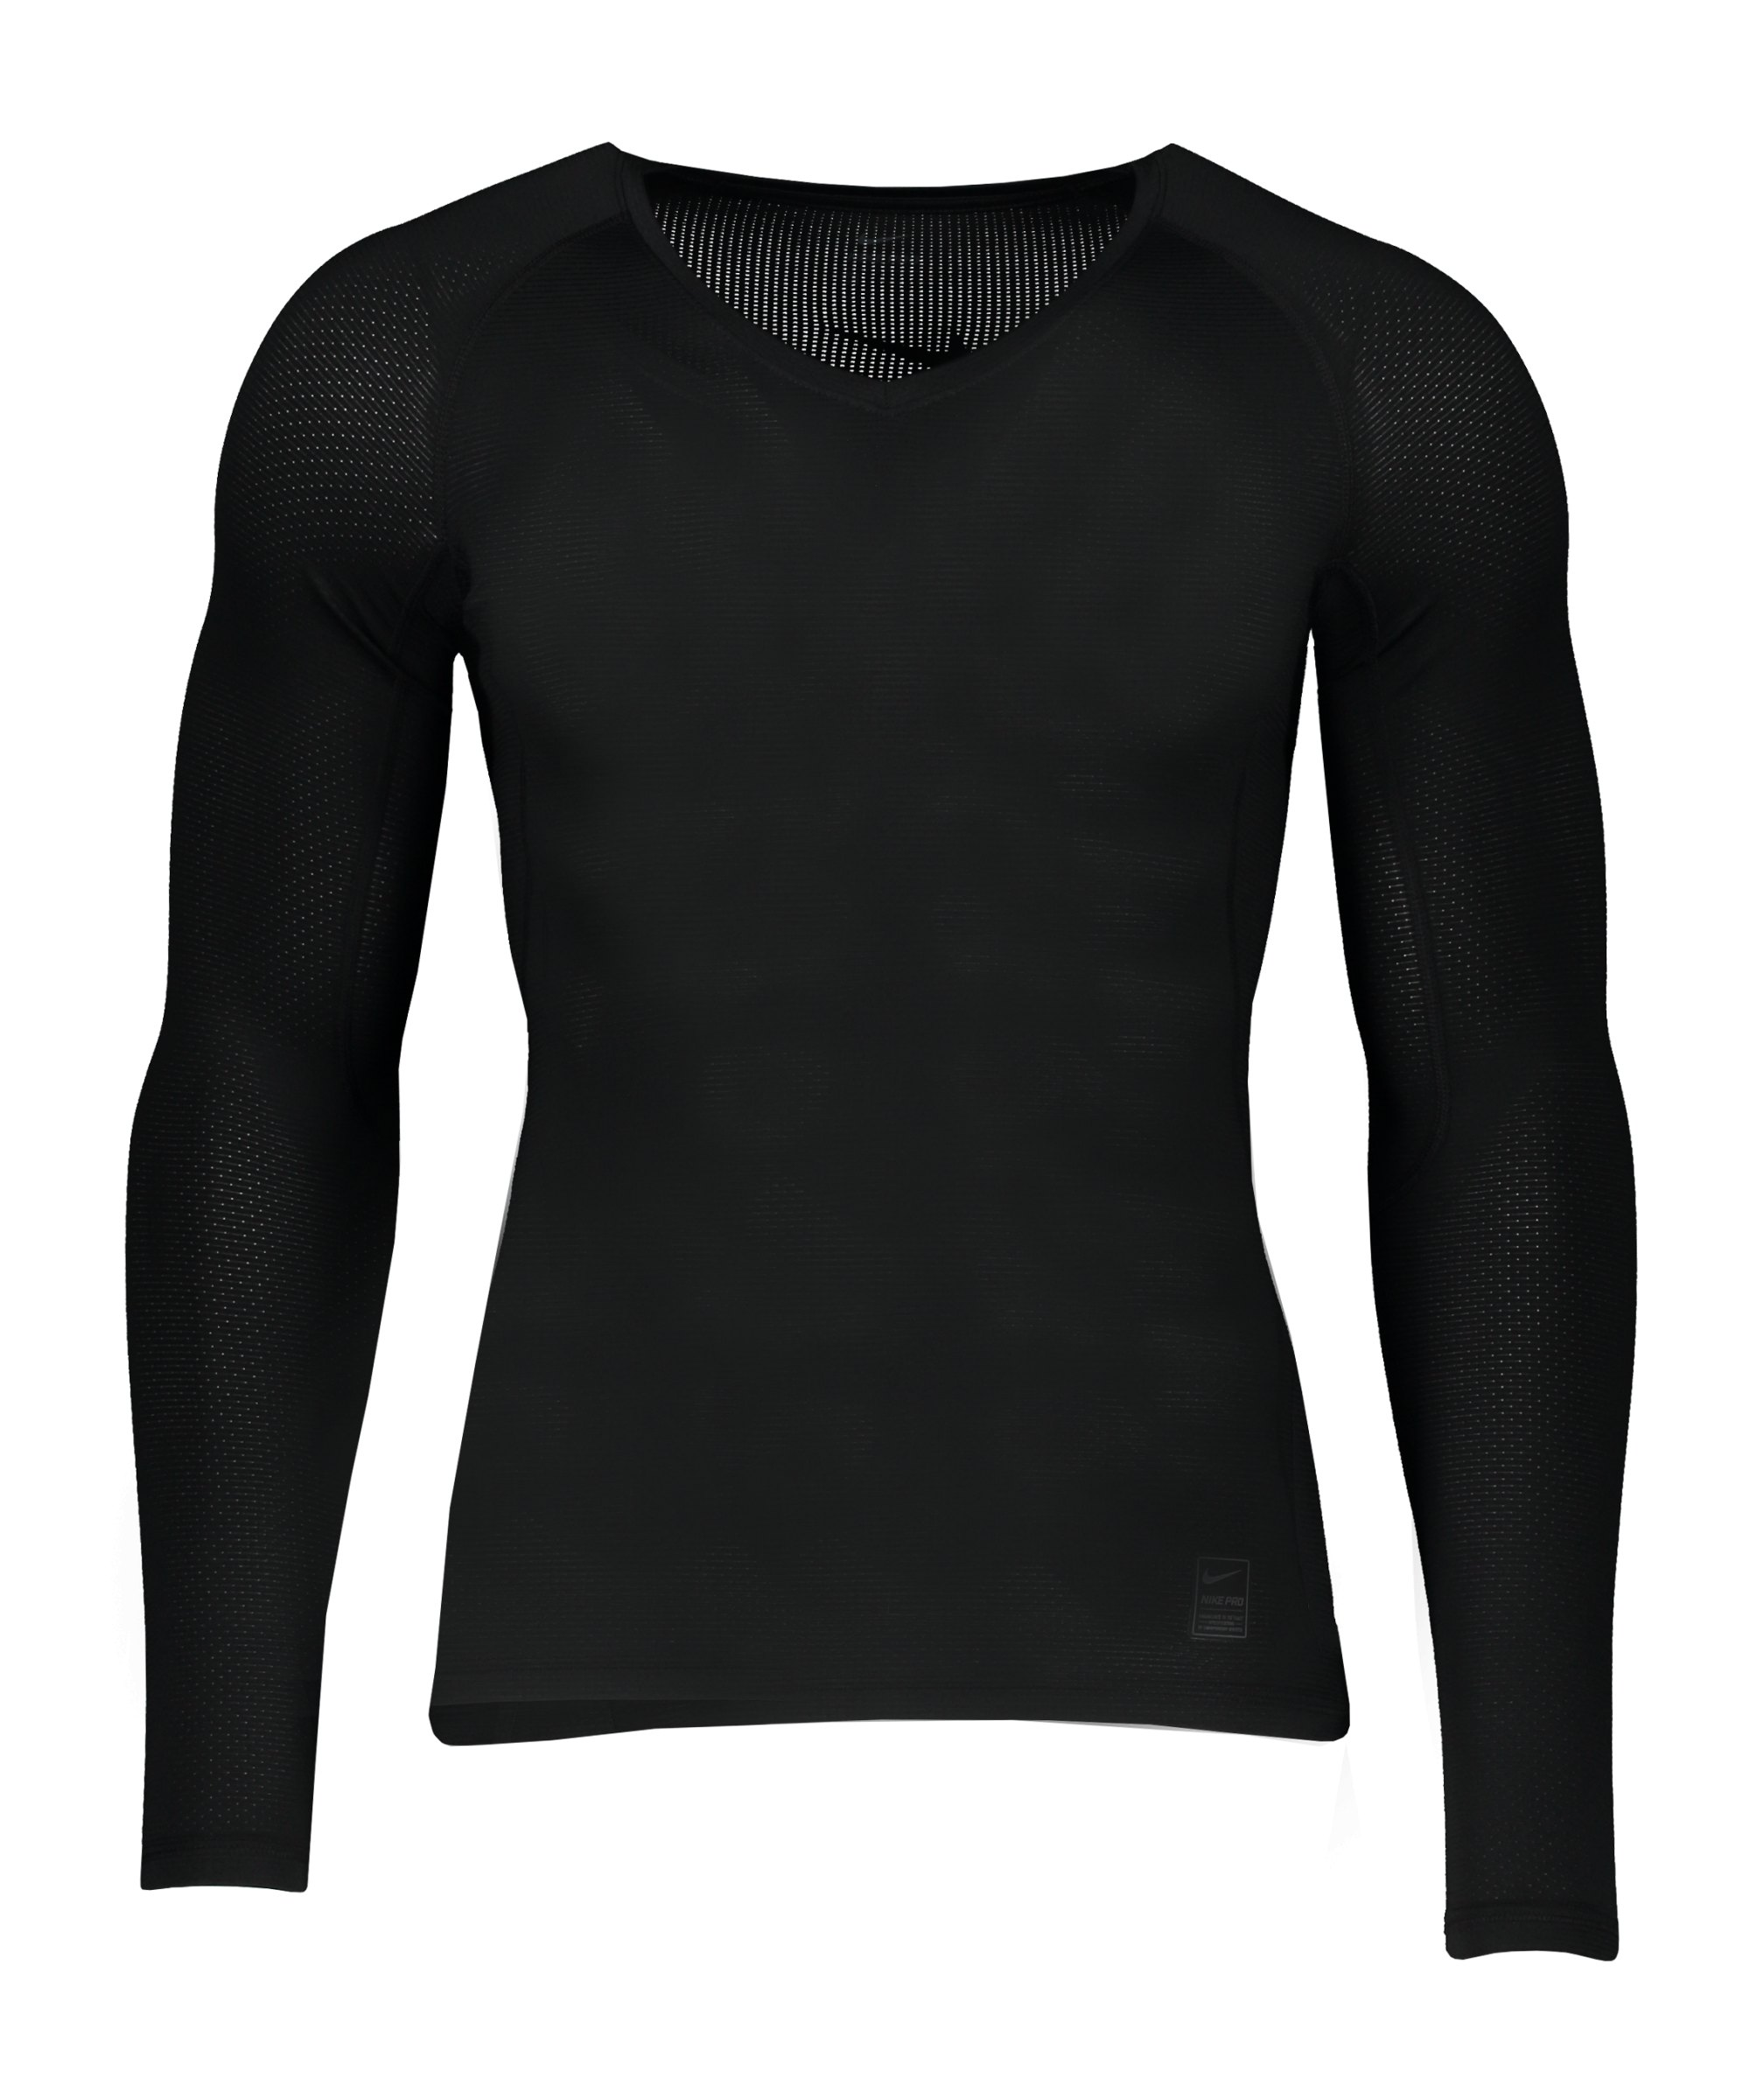 Nike Pro Hypercool Comp Shirt langarm Schwarz F010 - schwarz